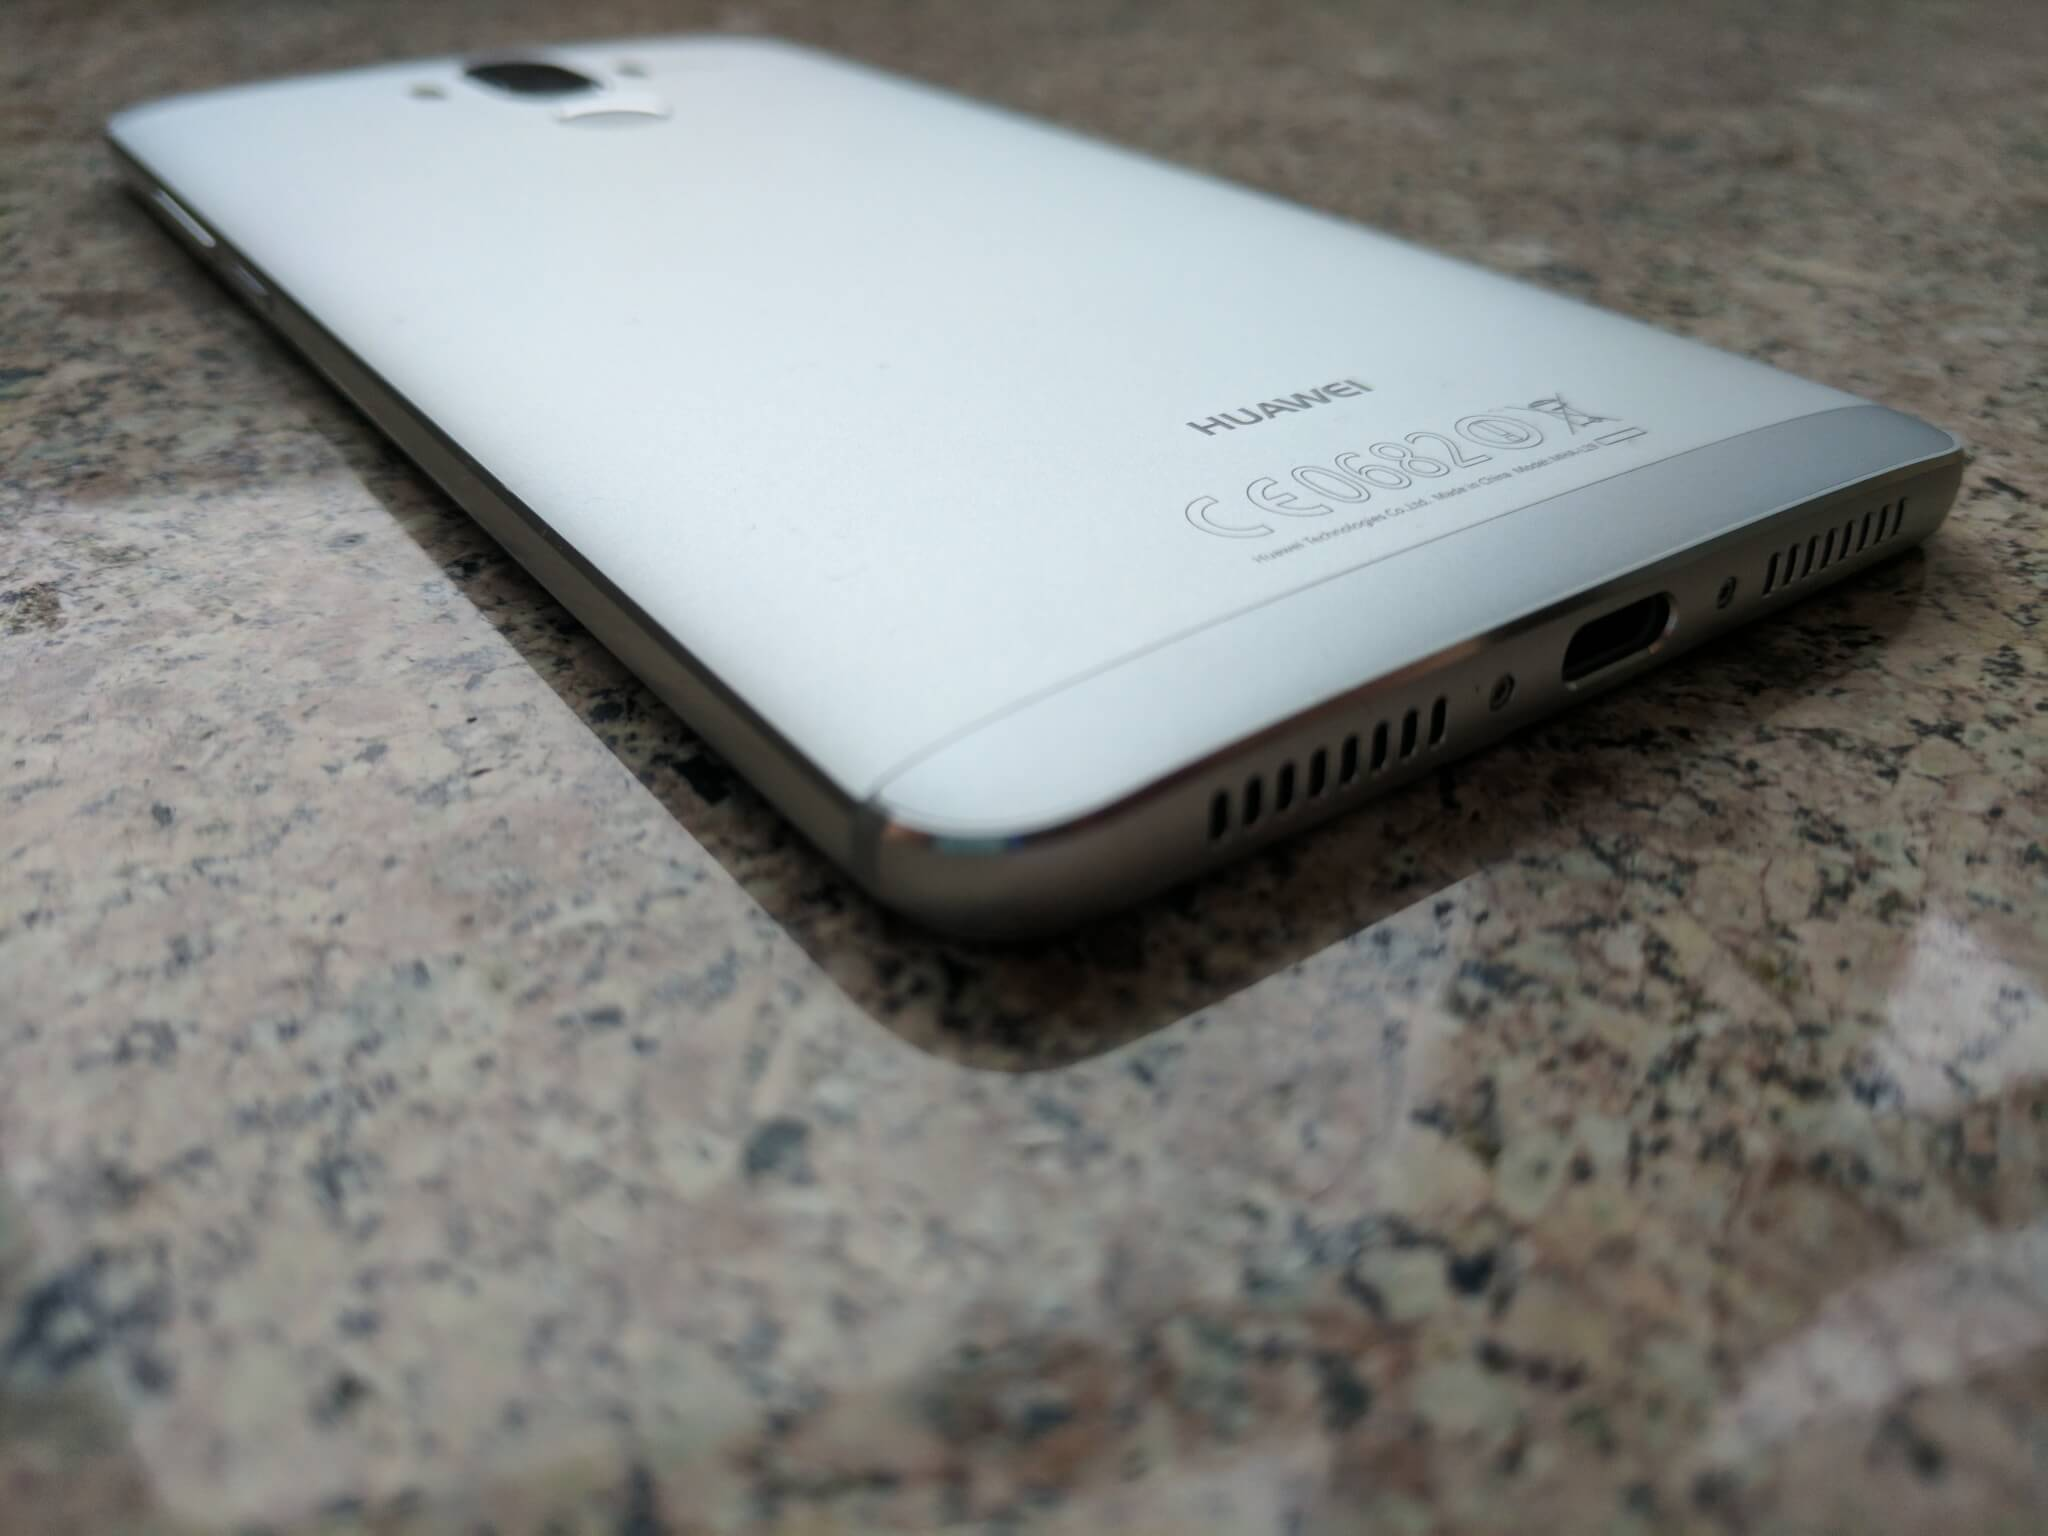 USB-C port on bottom of the Huawei Mate 9.